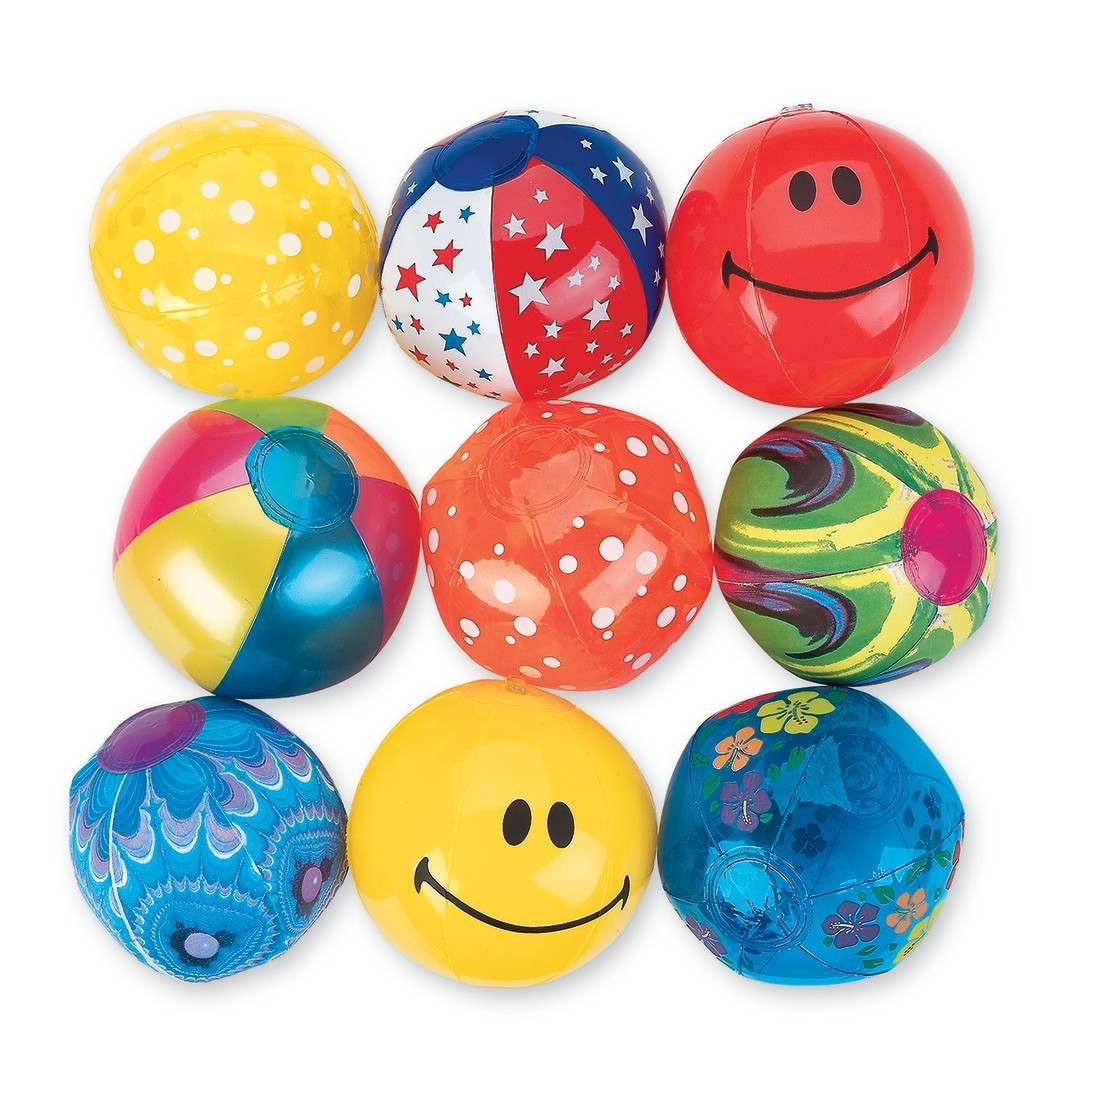 Beach Balls [image]